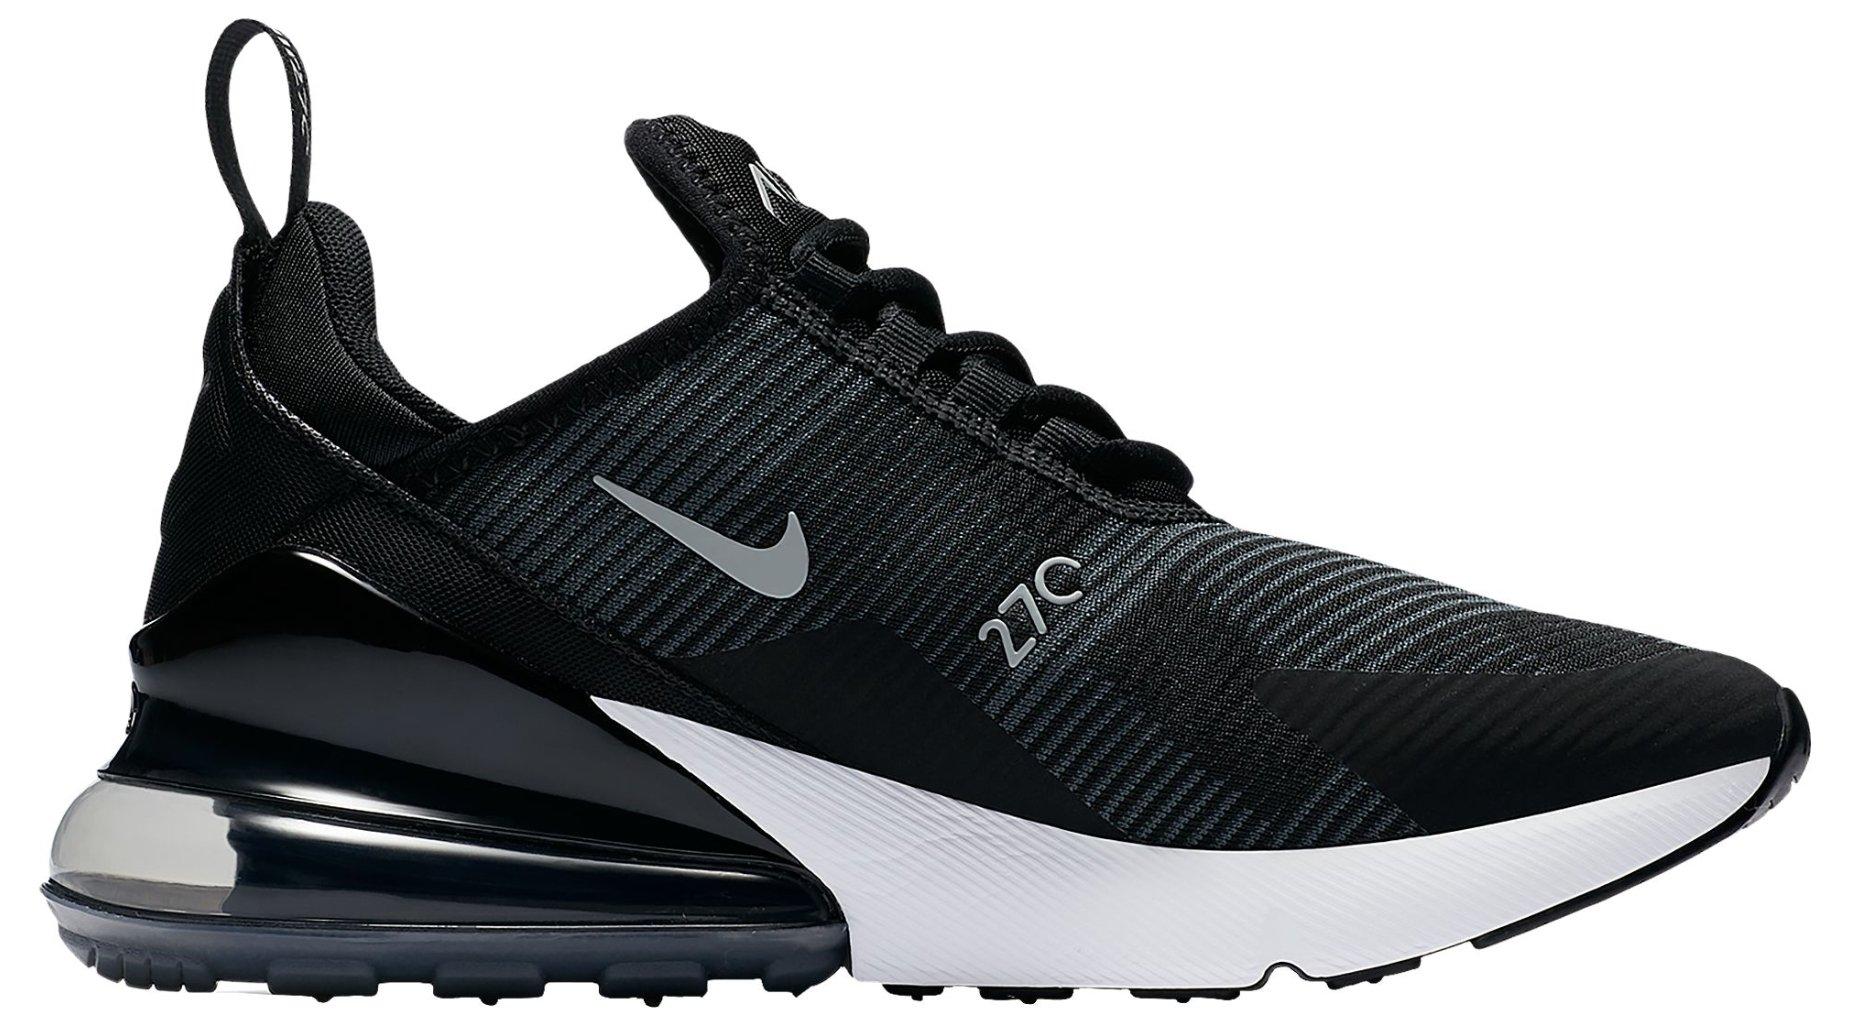 low priced a4123 d8613 Galleon - Nike Air Max 270 Kjcrd (gs) Big Kids Ar0301-008 Size 3.5